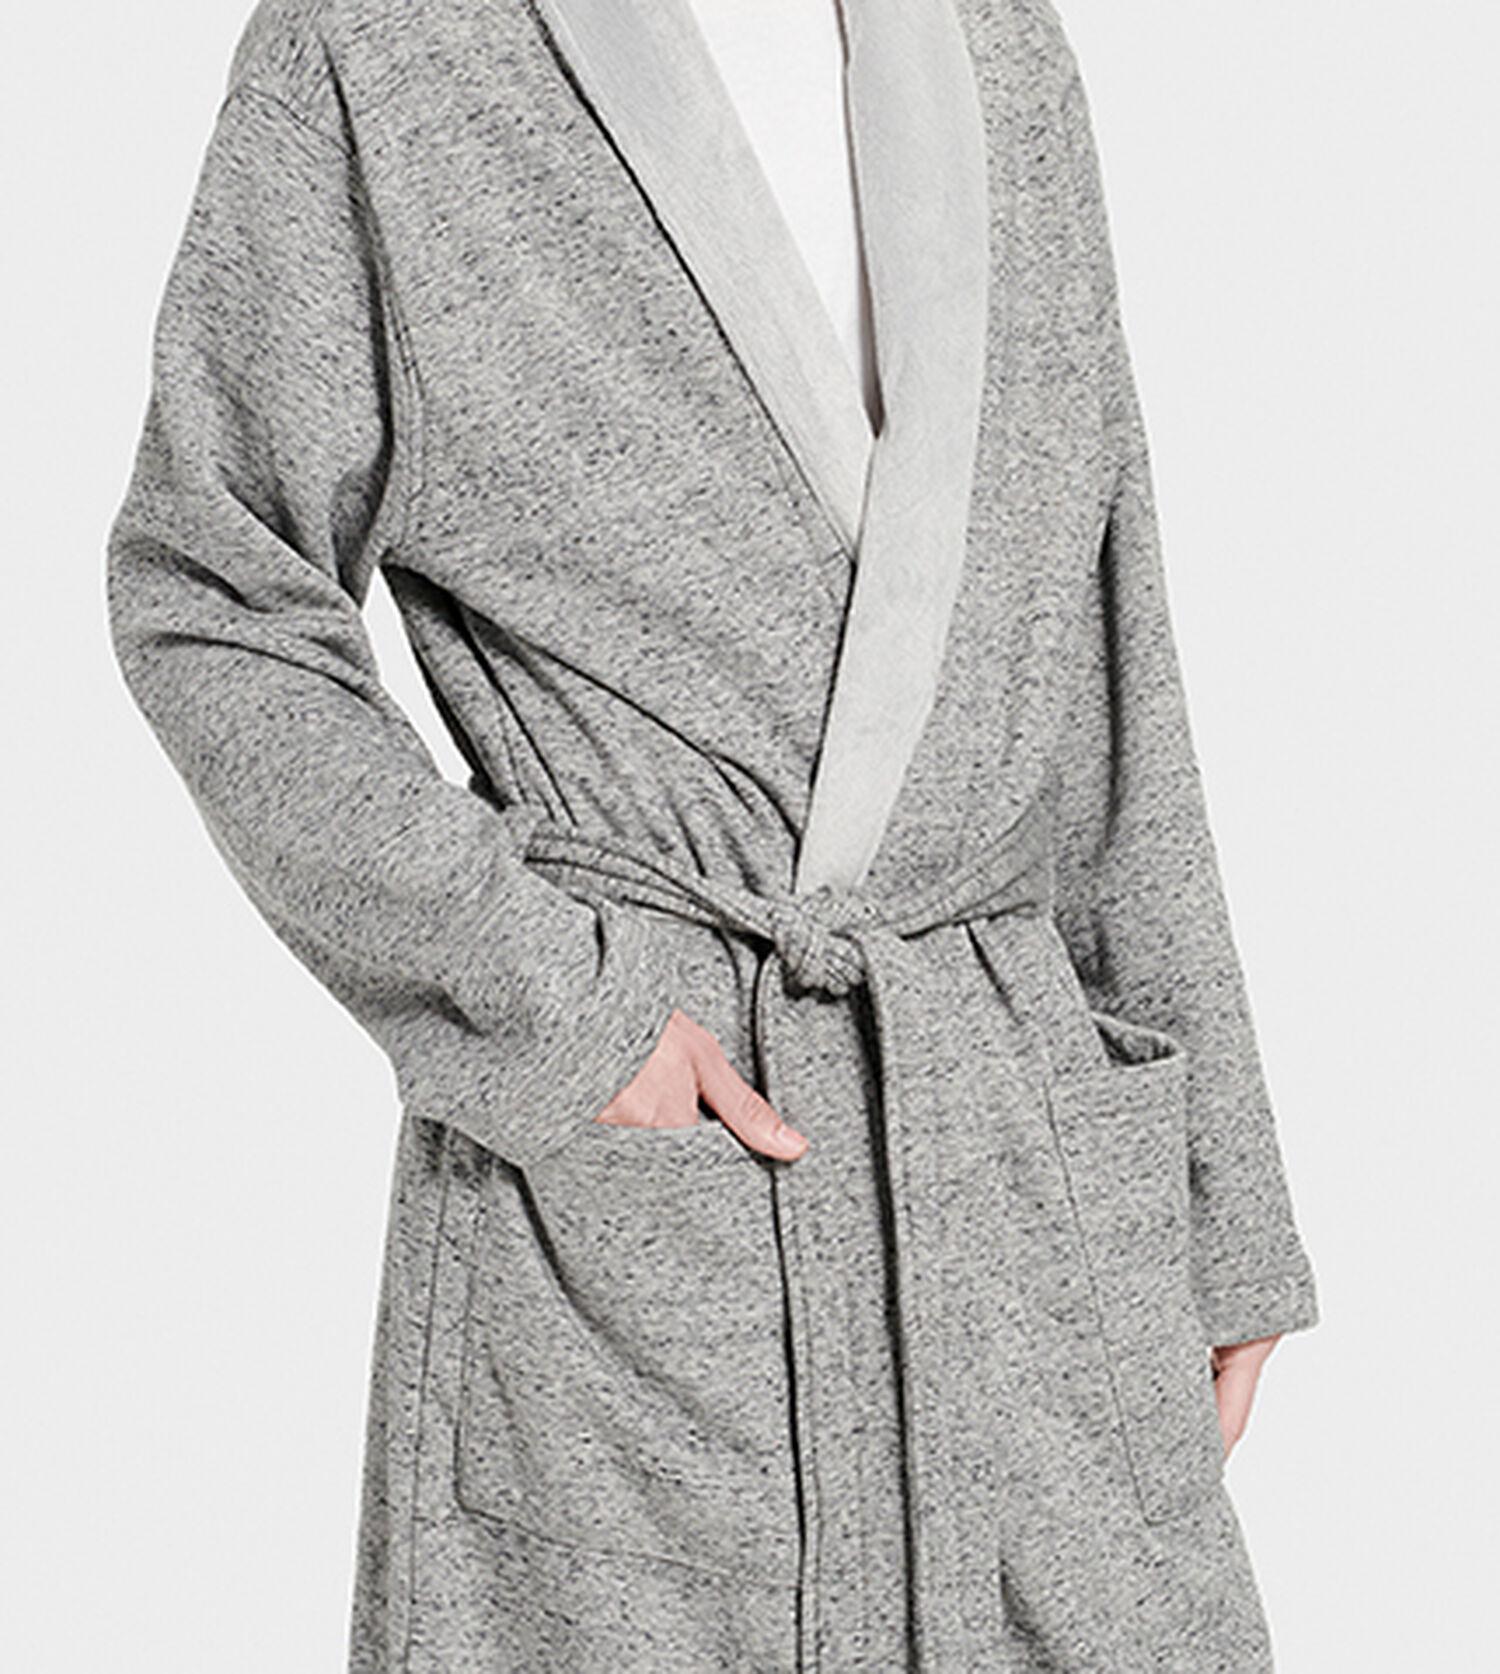 936306fd54 Zoom Robinson Robe - Image 4 of 5